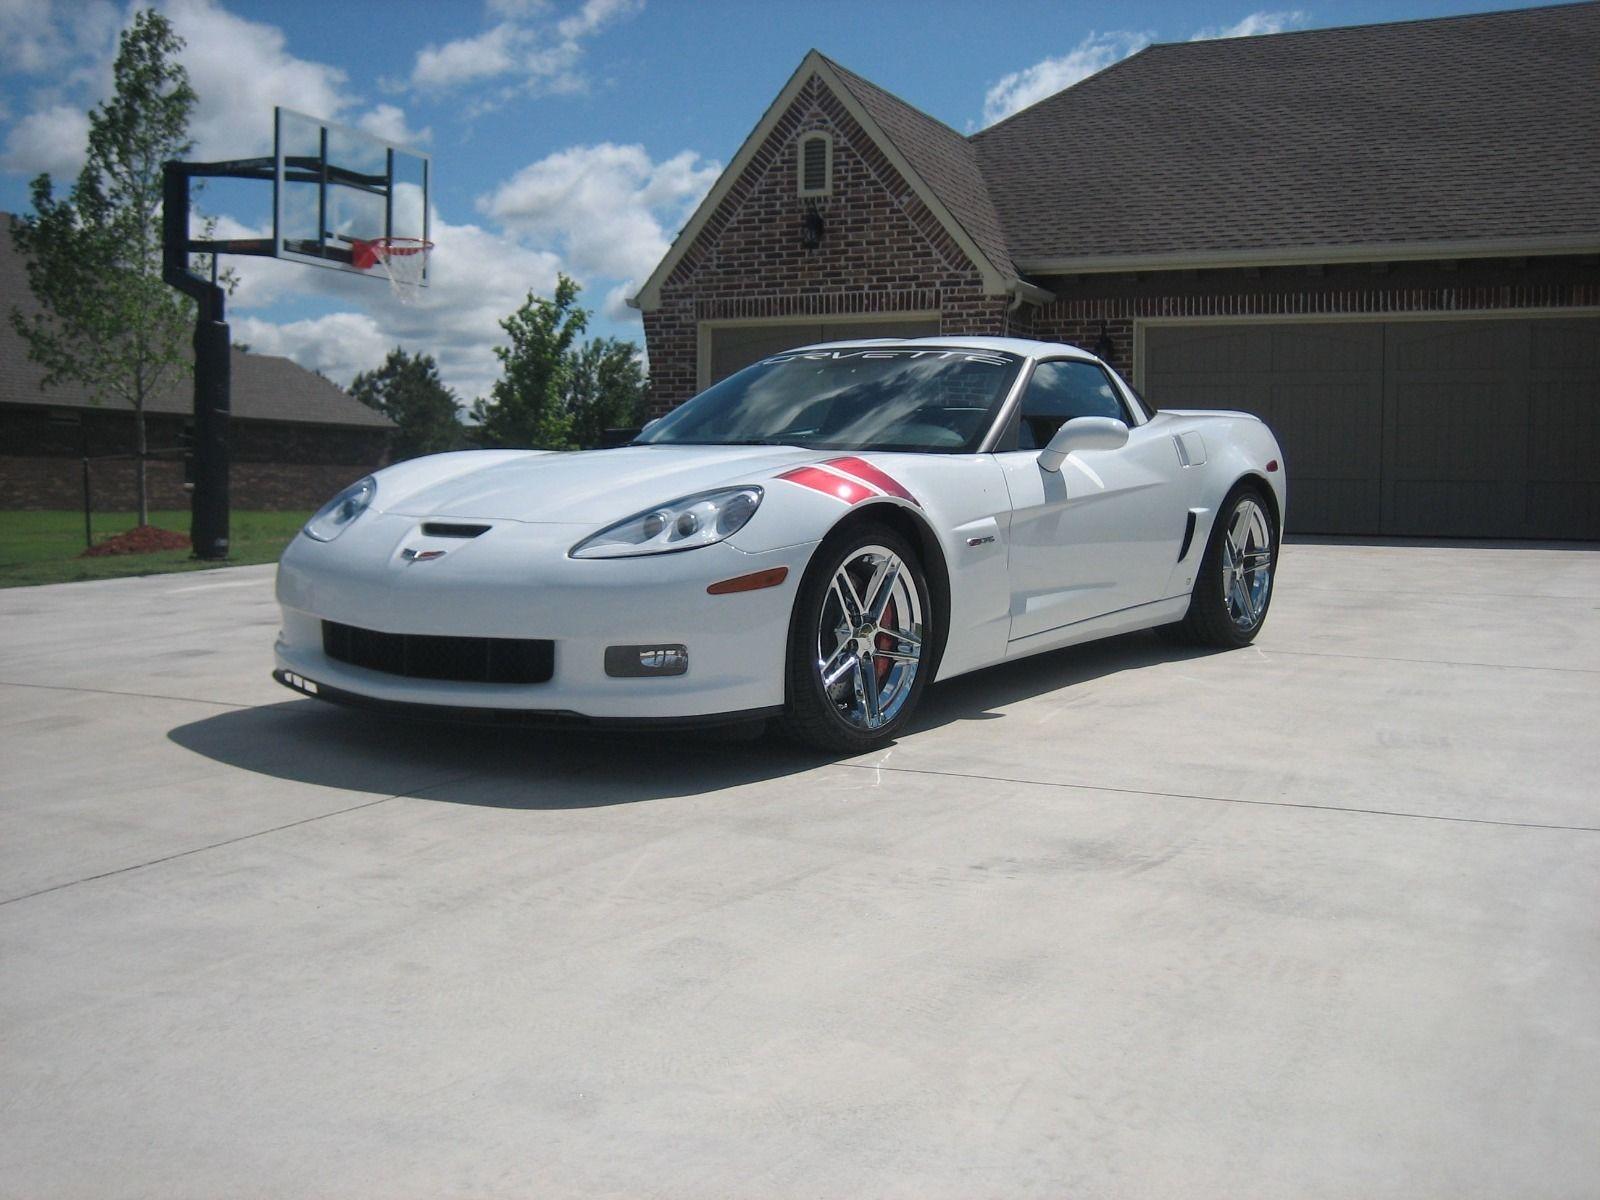 2007 Ron Fellows Corvette Z06 For Sale